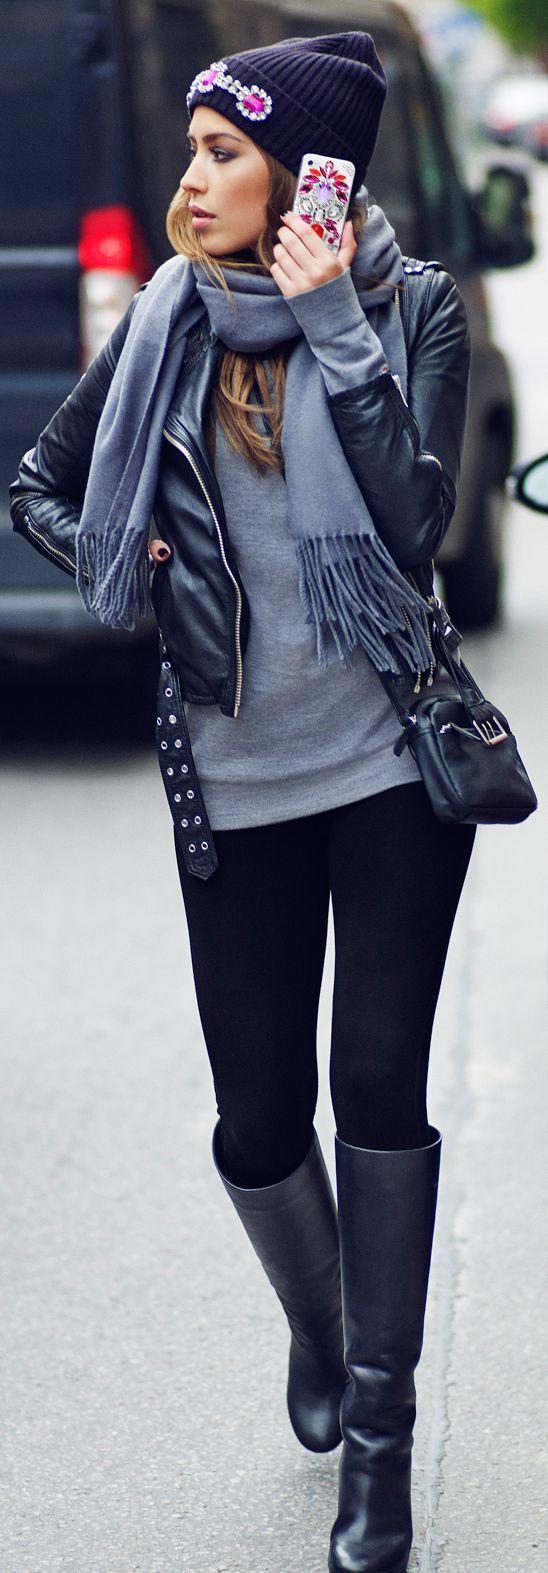 Grey long sleeve shirt and black leggings, diggin the jeweled bennie